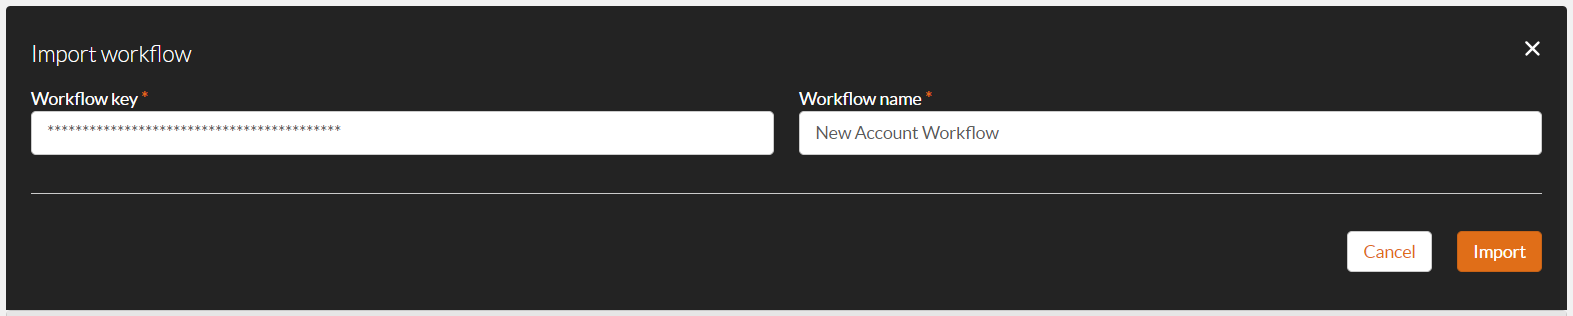 Integrating Transact Web Services with Nintex | Ephesoft Docs